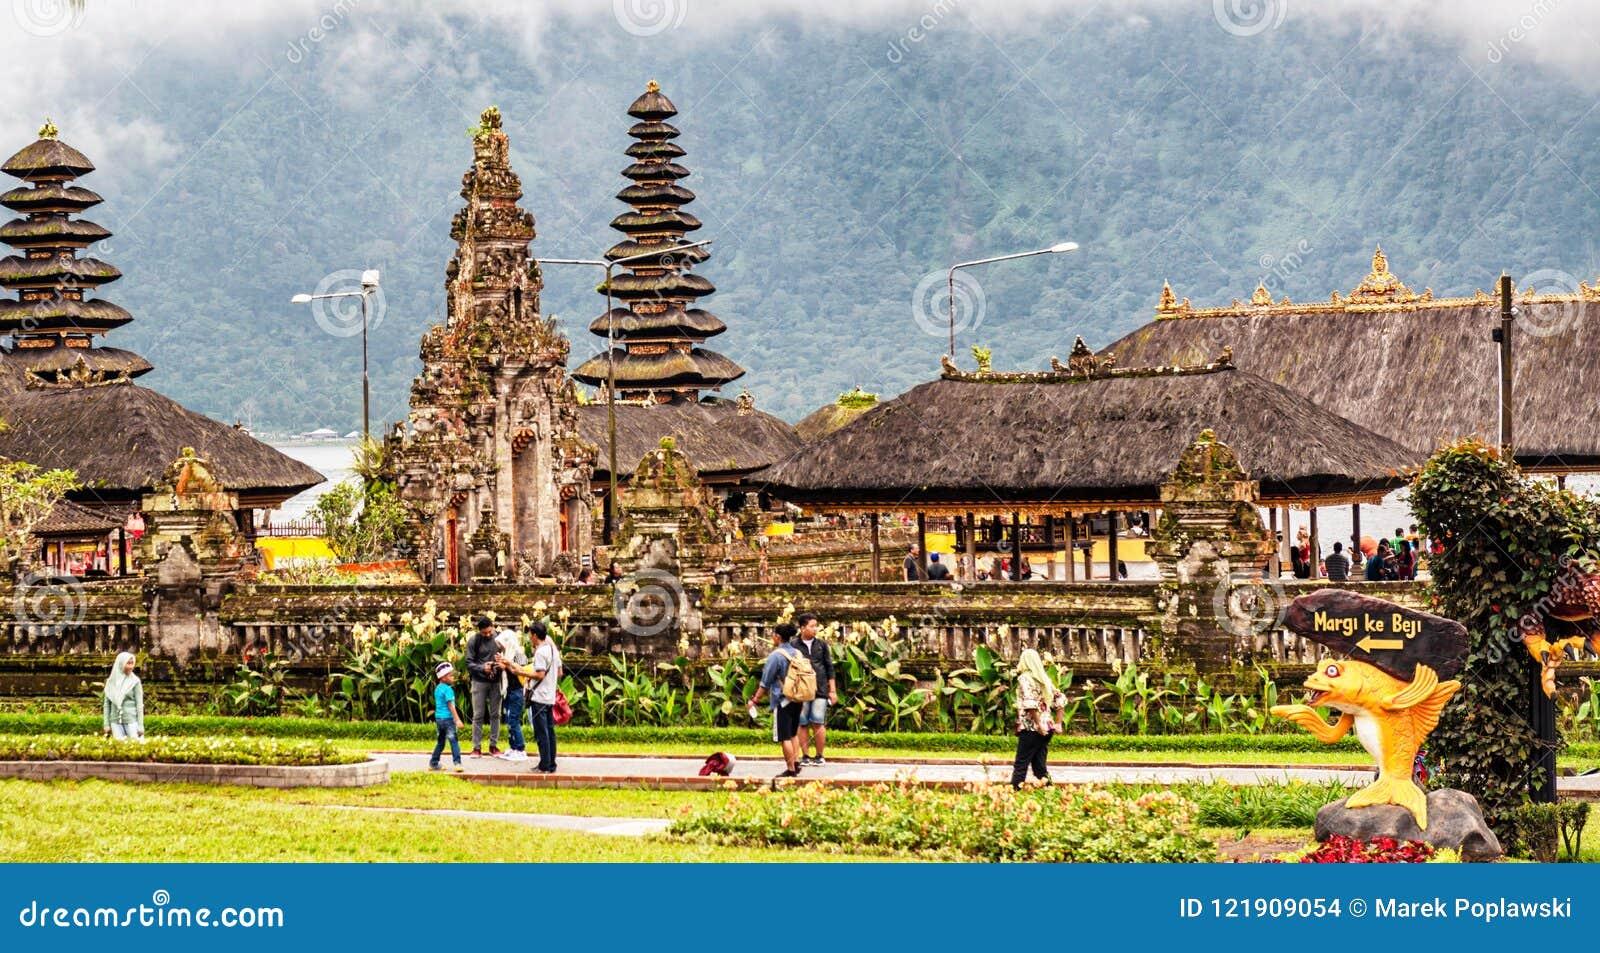 Pura Ulun Danu Beratan Or Pura Bratan Water Temple On Bali Ind